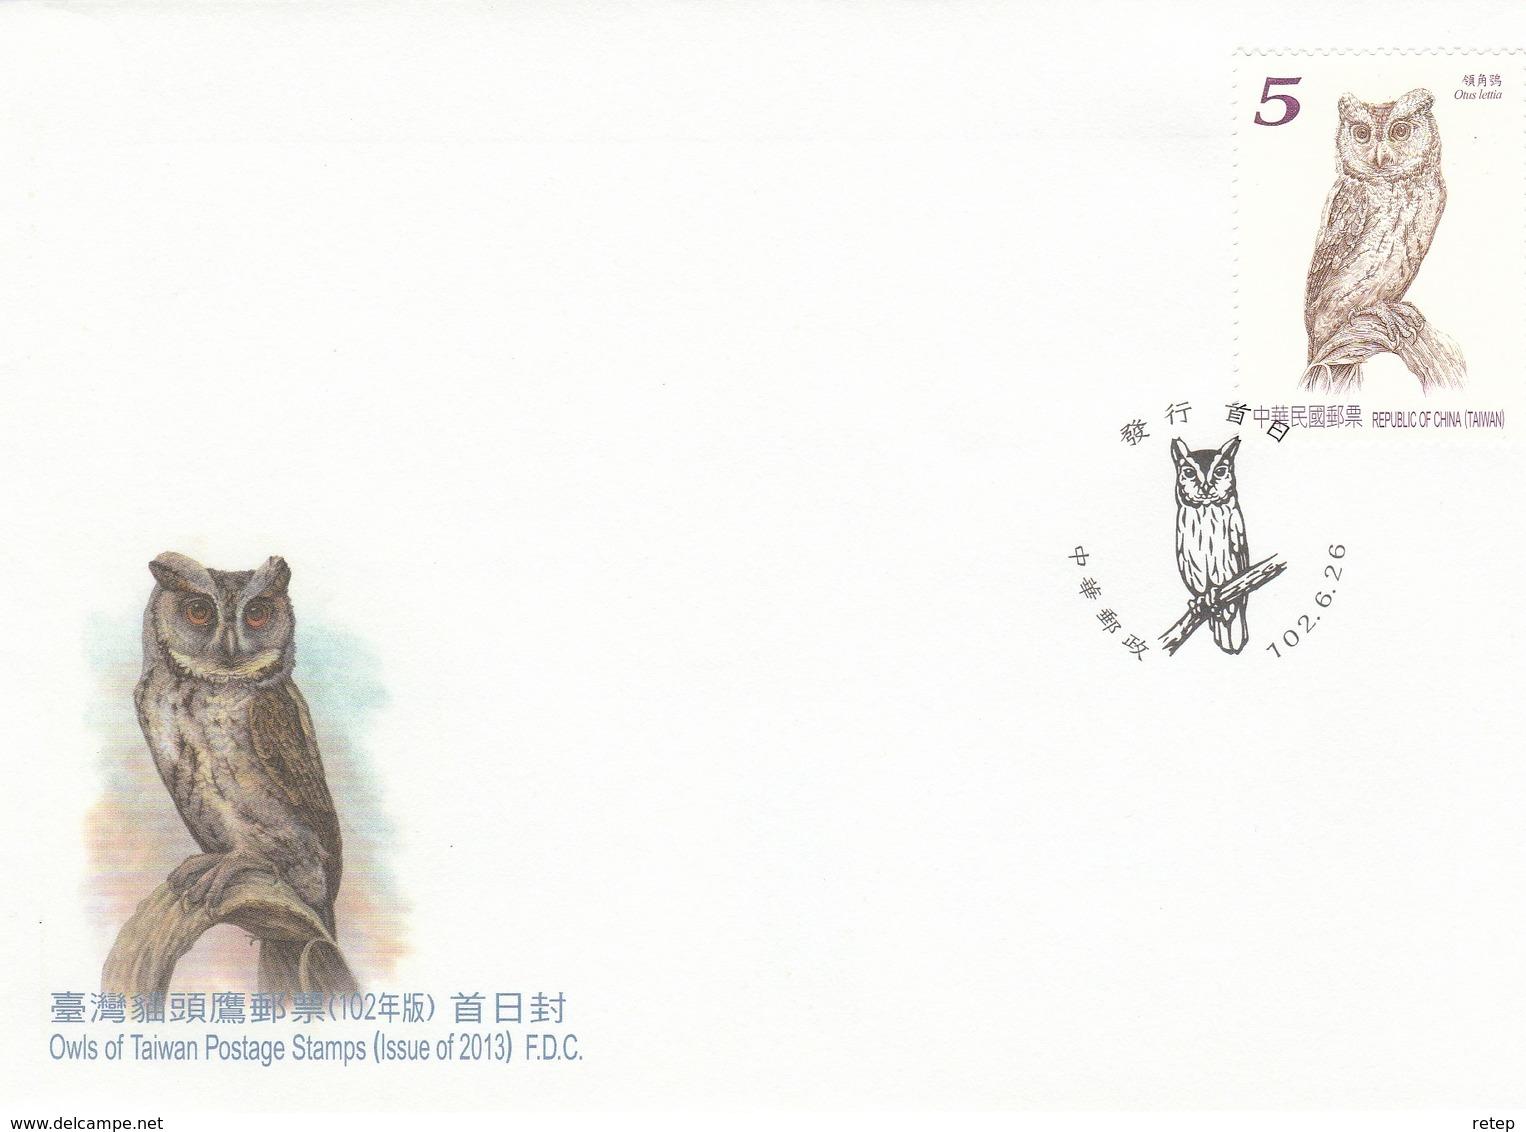 Taiwan 2013, FDC - Owls